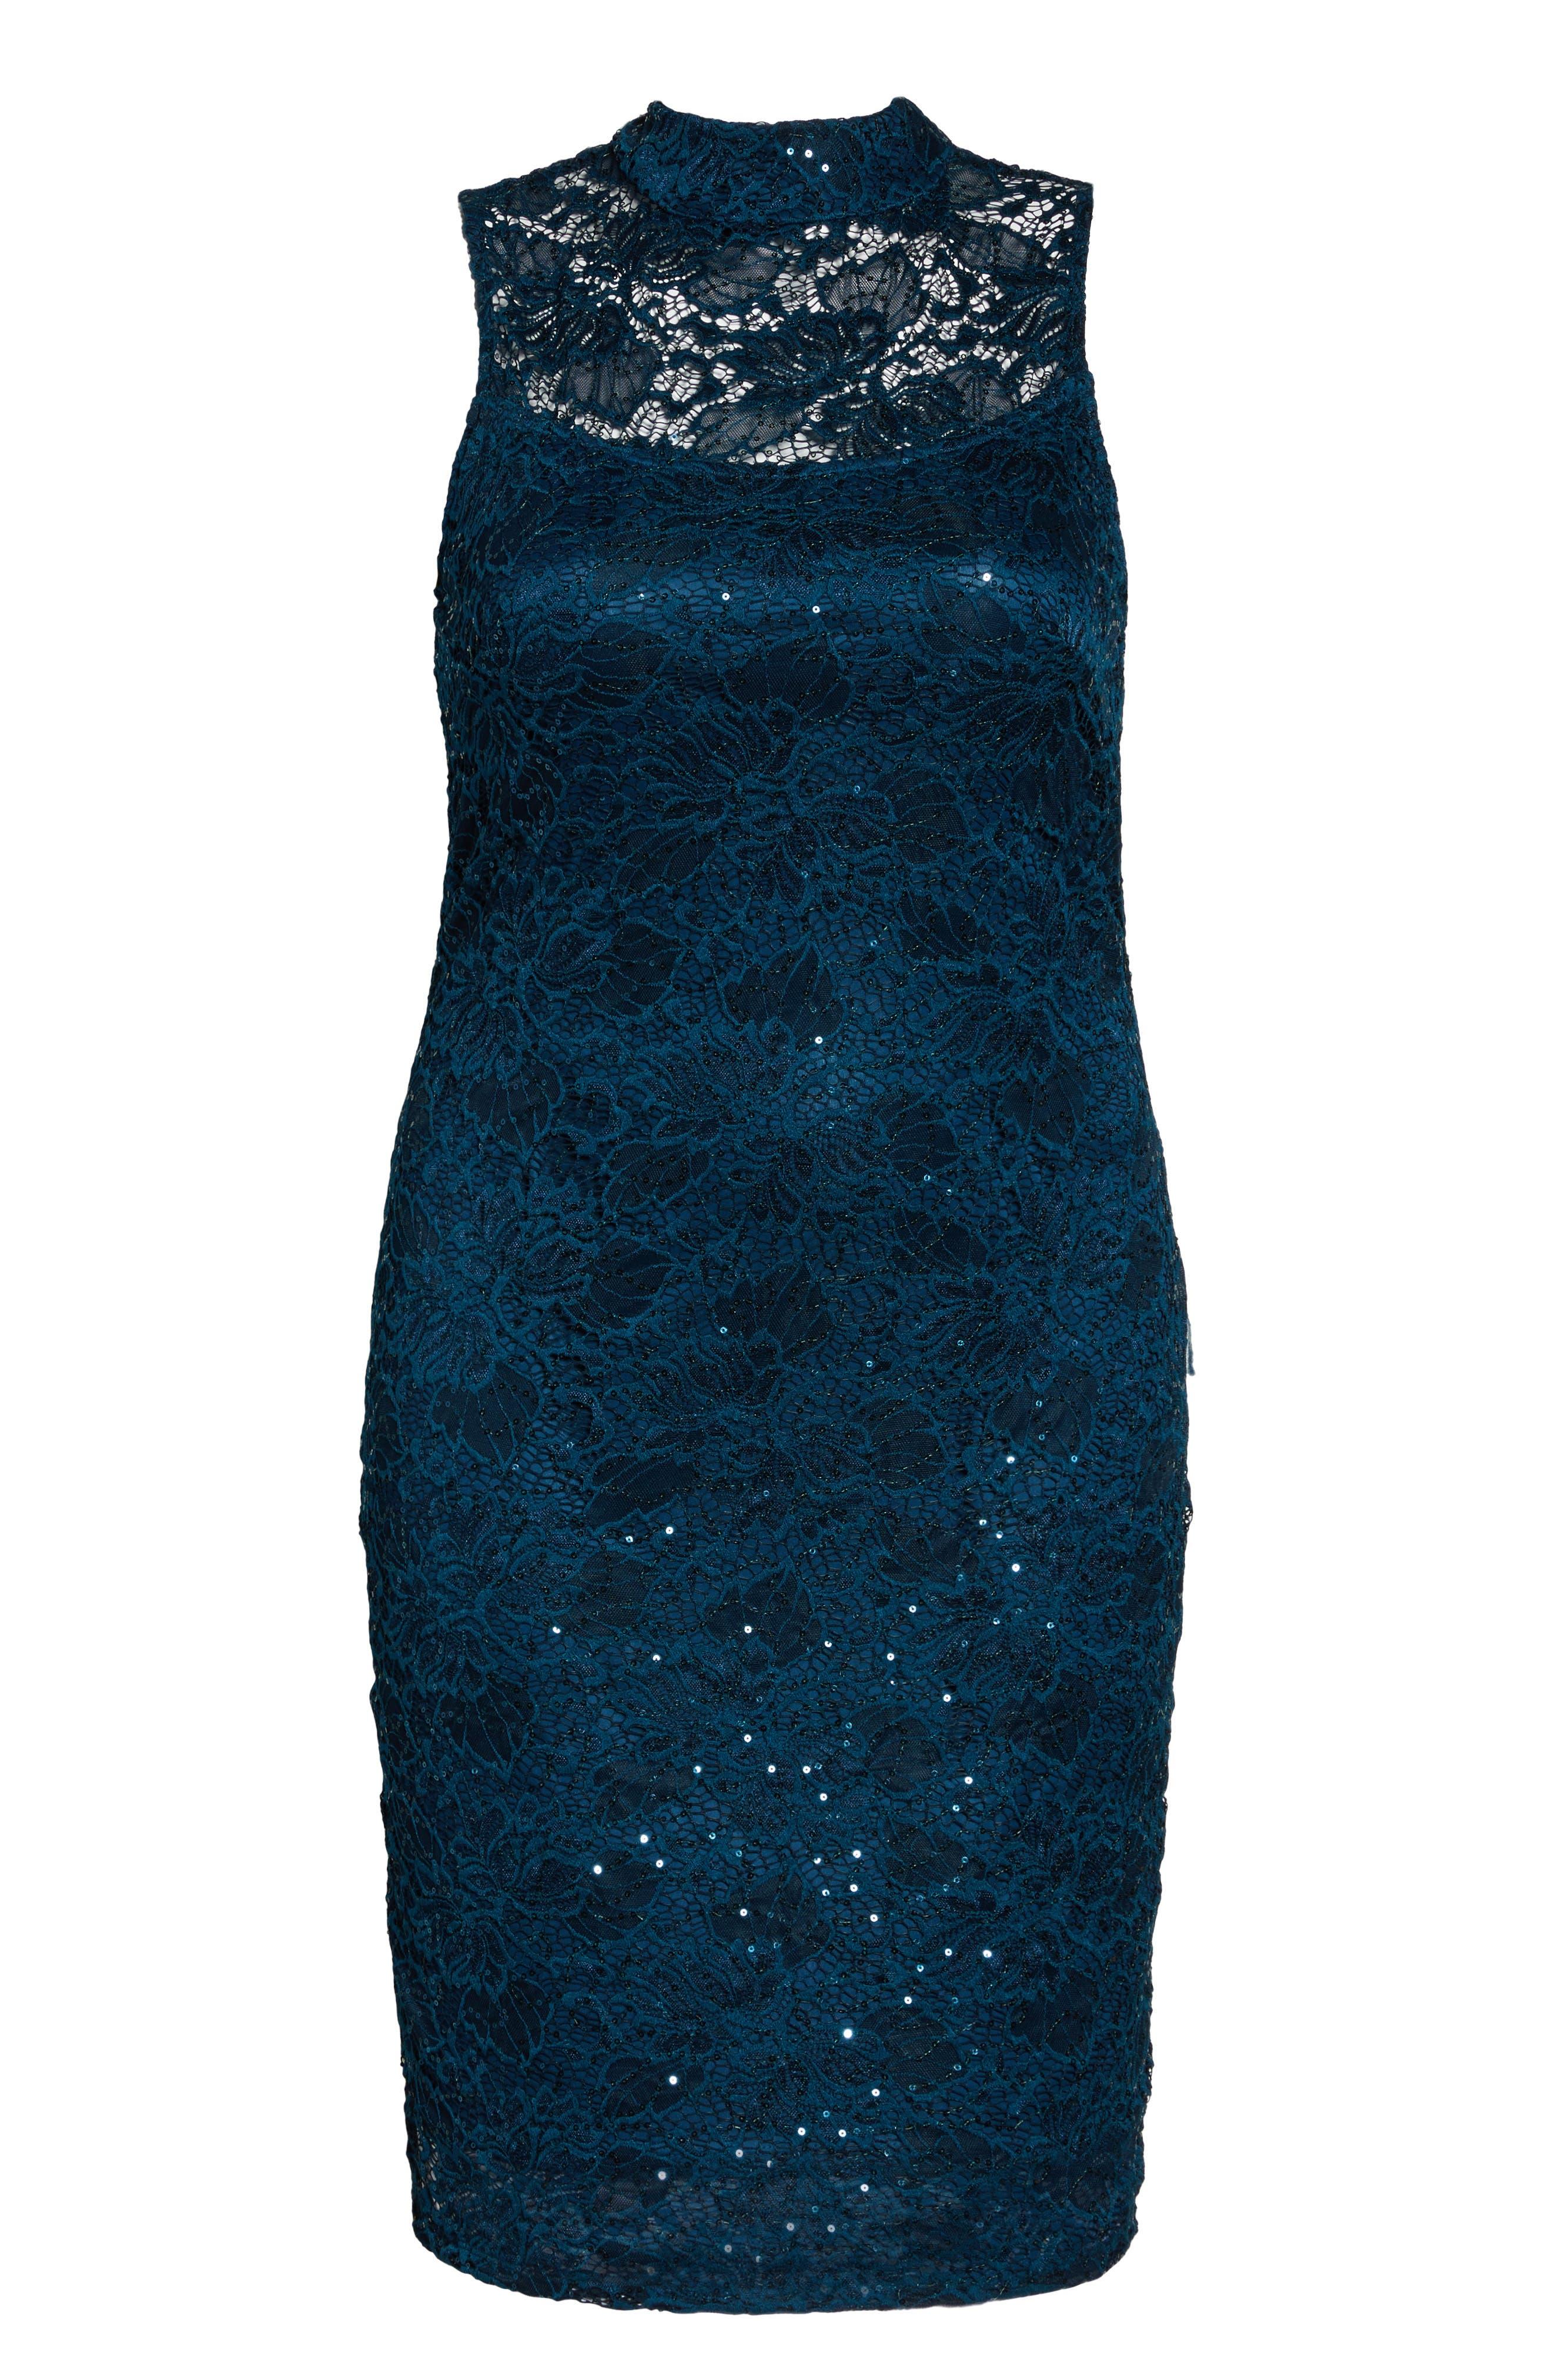 Sequin Lace Sheath Dress,                             Main thumbnail 1, color,                             Teal